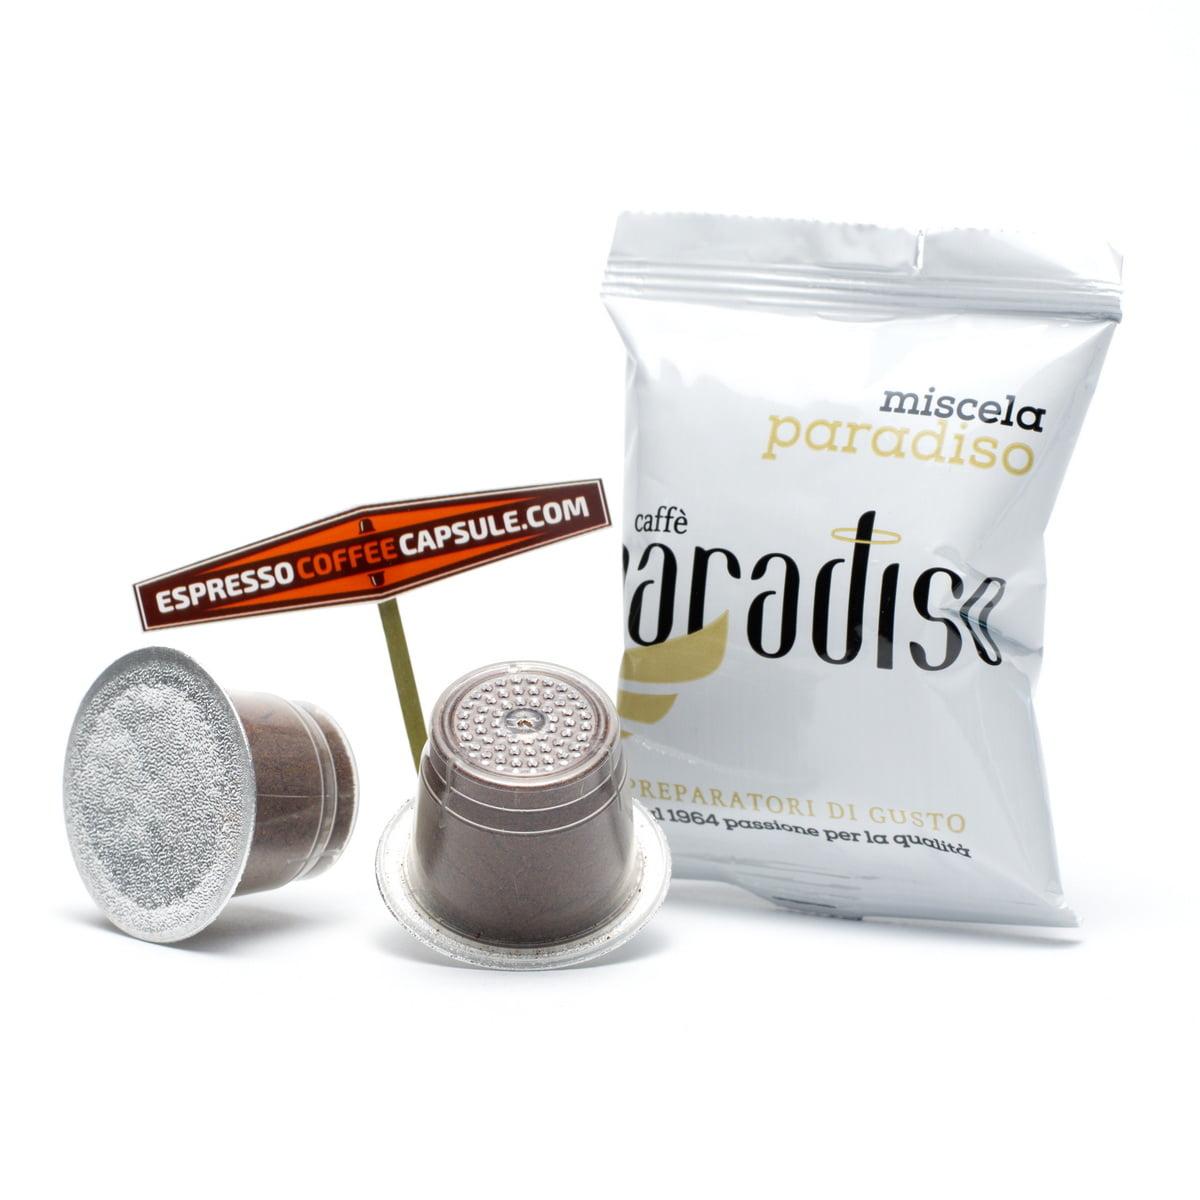 PARADISO Top Class coffee capsules for nespresso